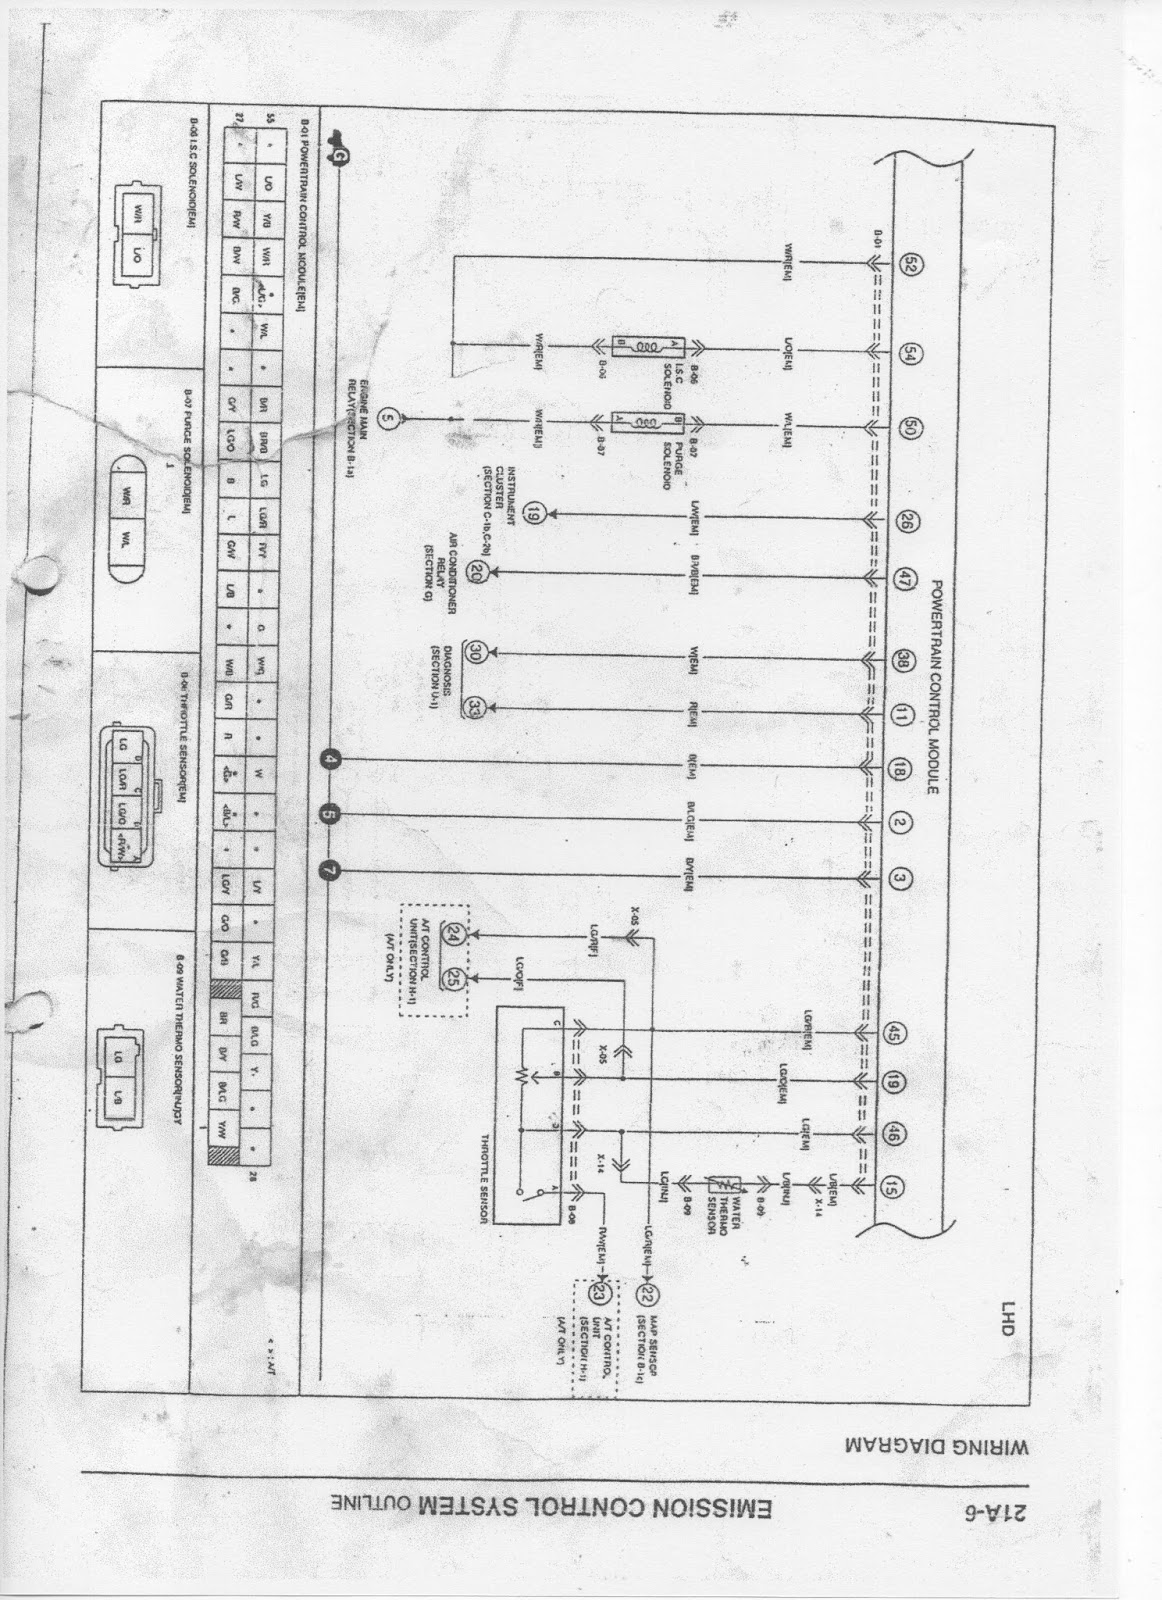 Wiring diagram efi toyota avanza wiring diagram electrical wiring diagram toyota avanza asfbconference2016 Gallery